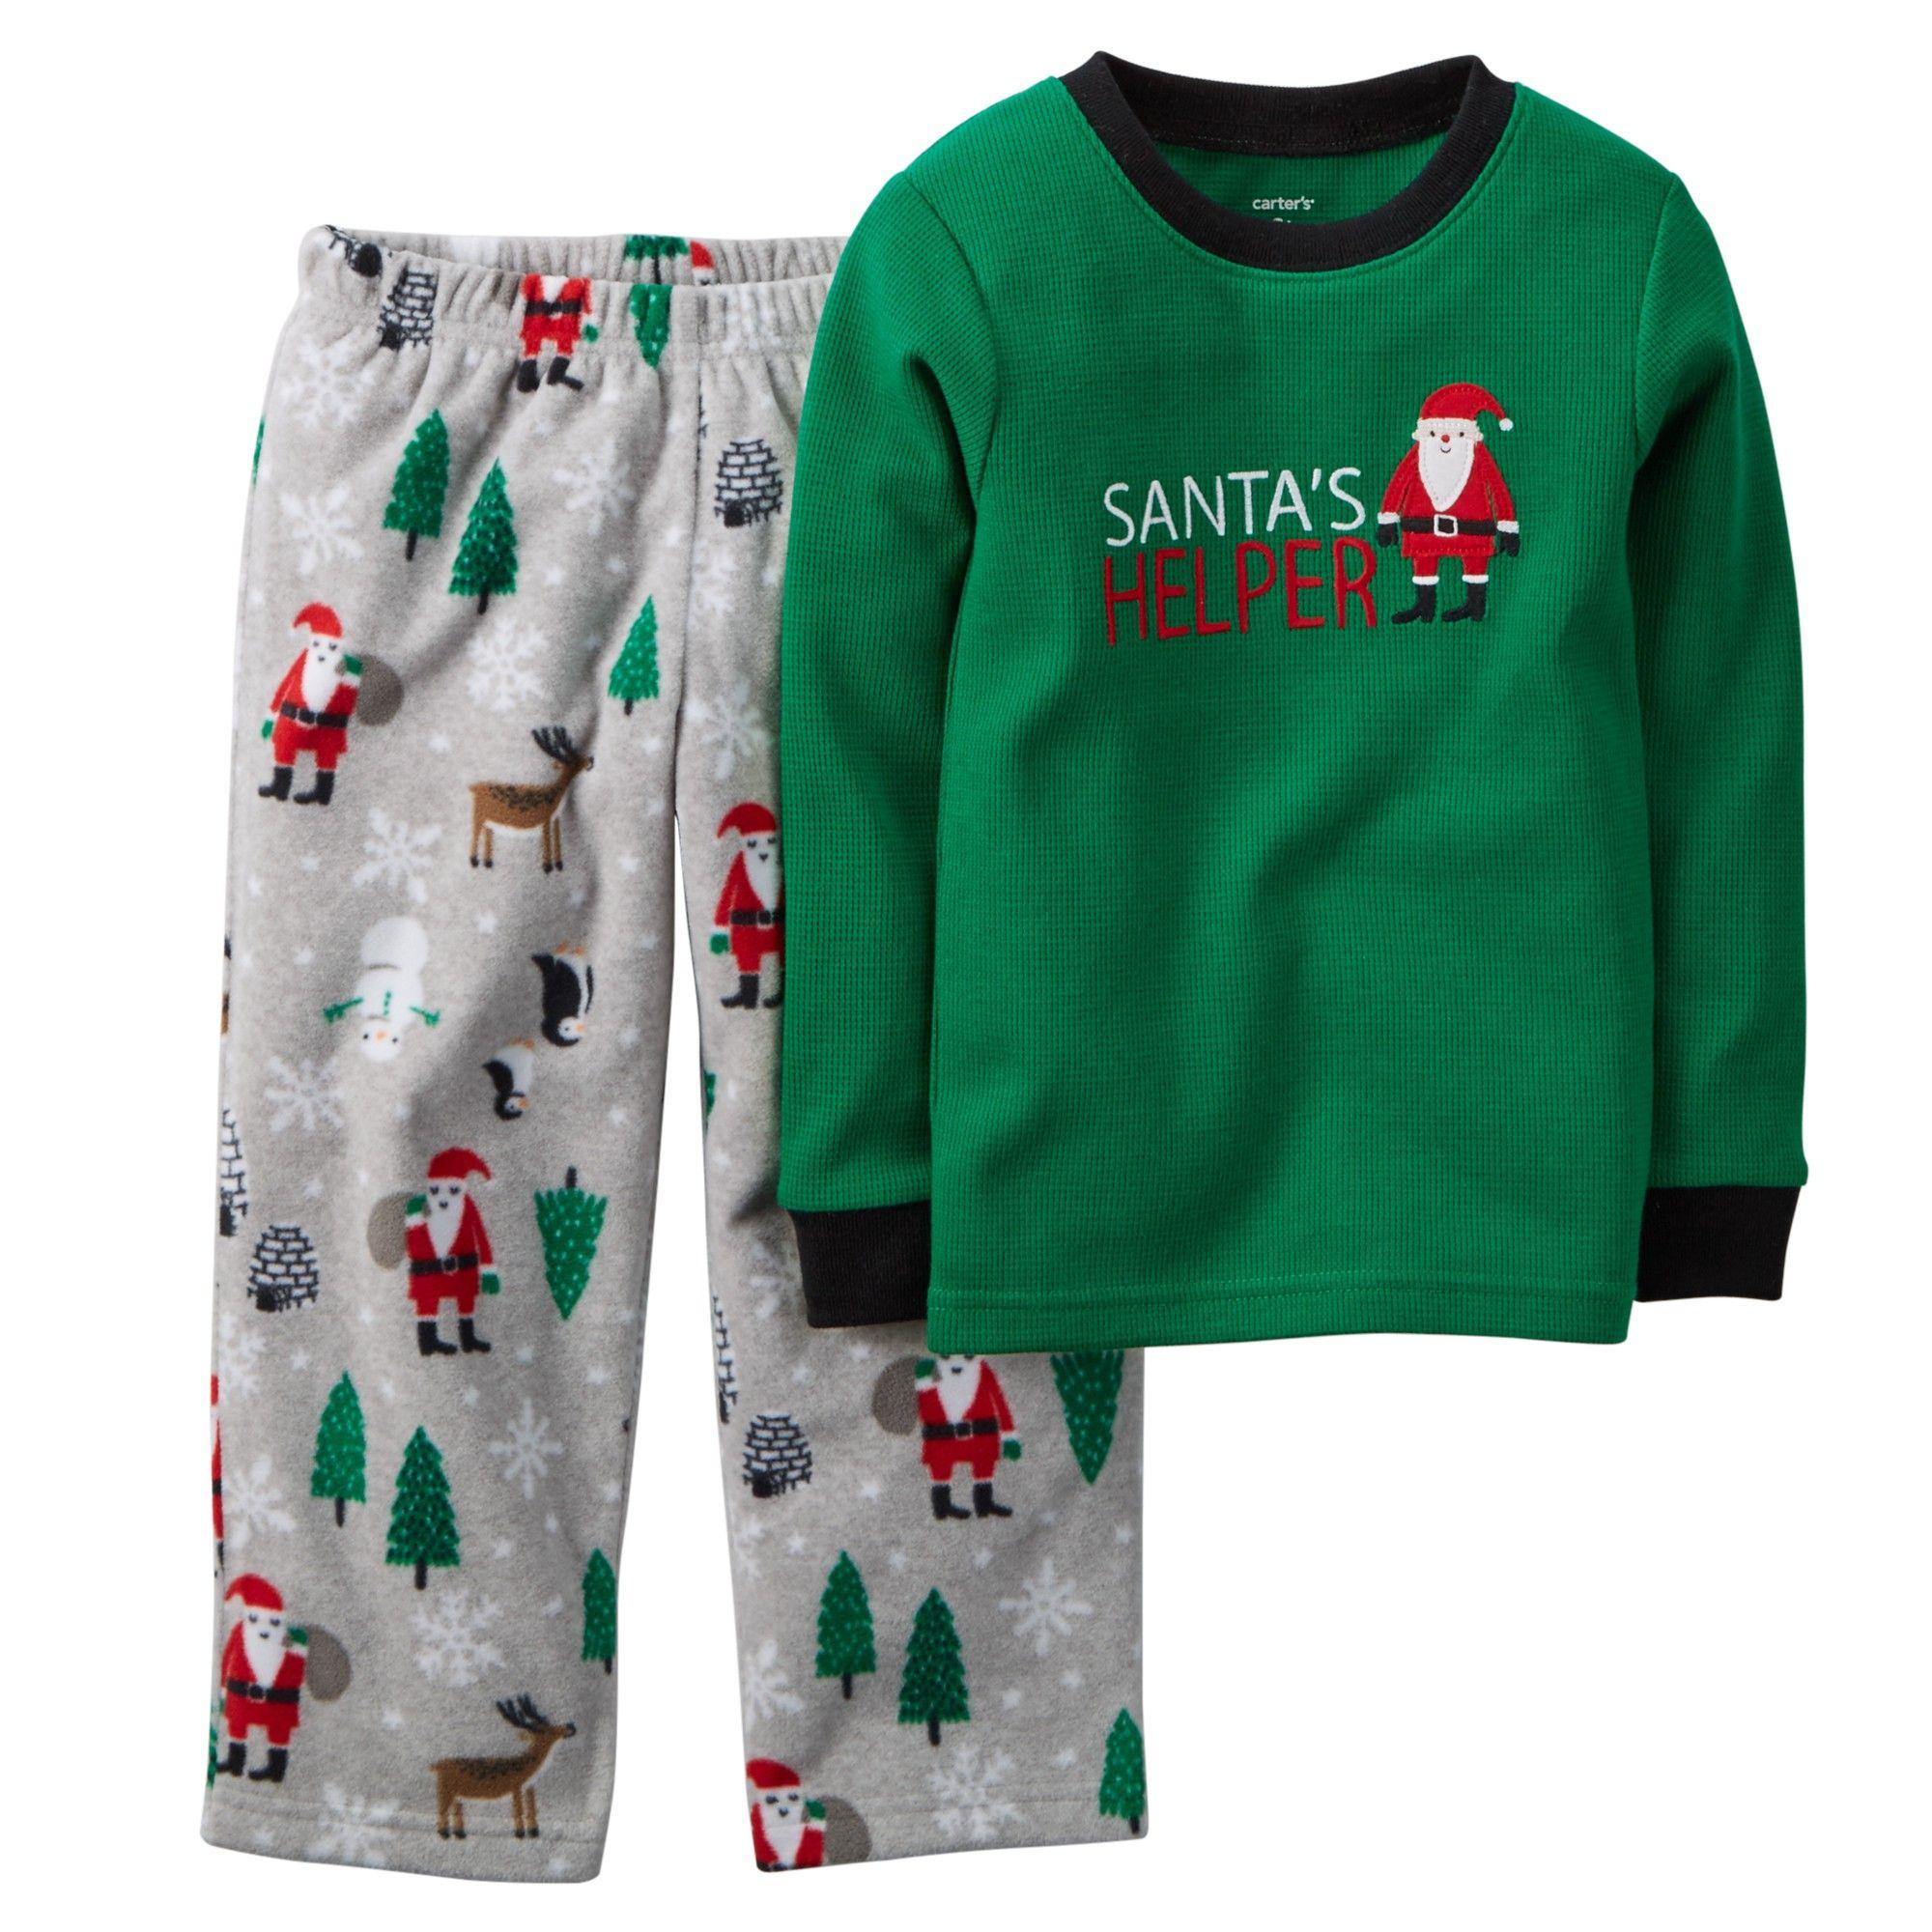 5c345ab43435 Hopscotch - carter s - 2-Piece Cotton   Fleece PJs - Green